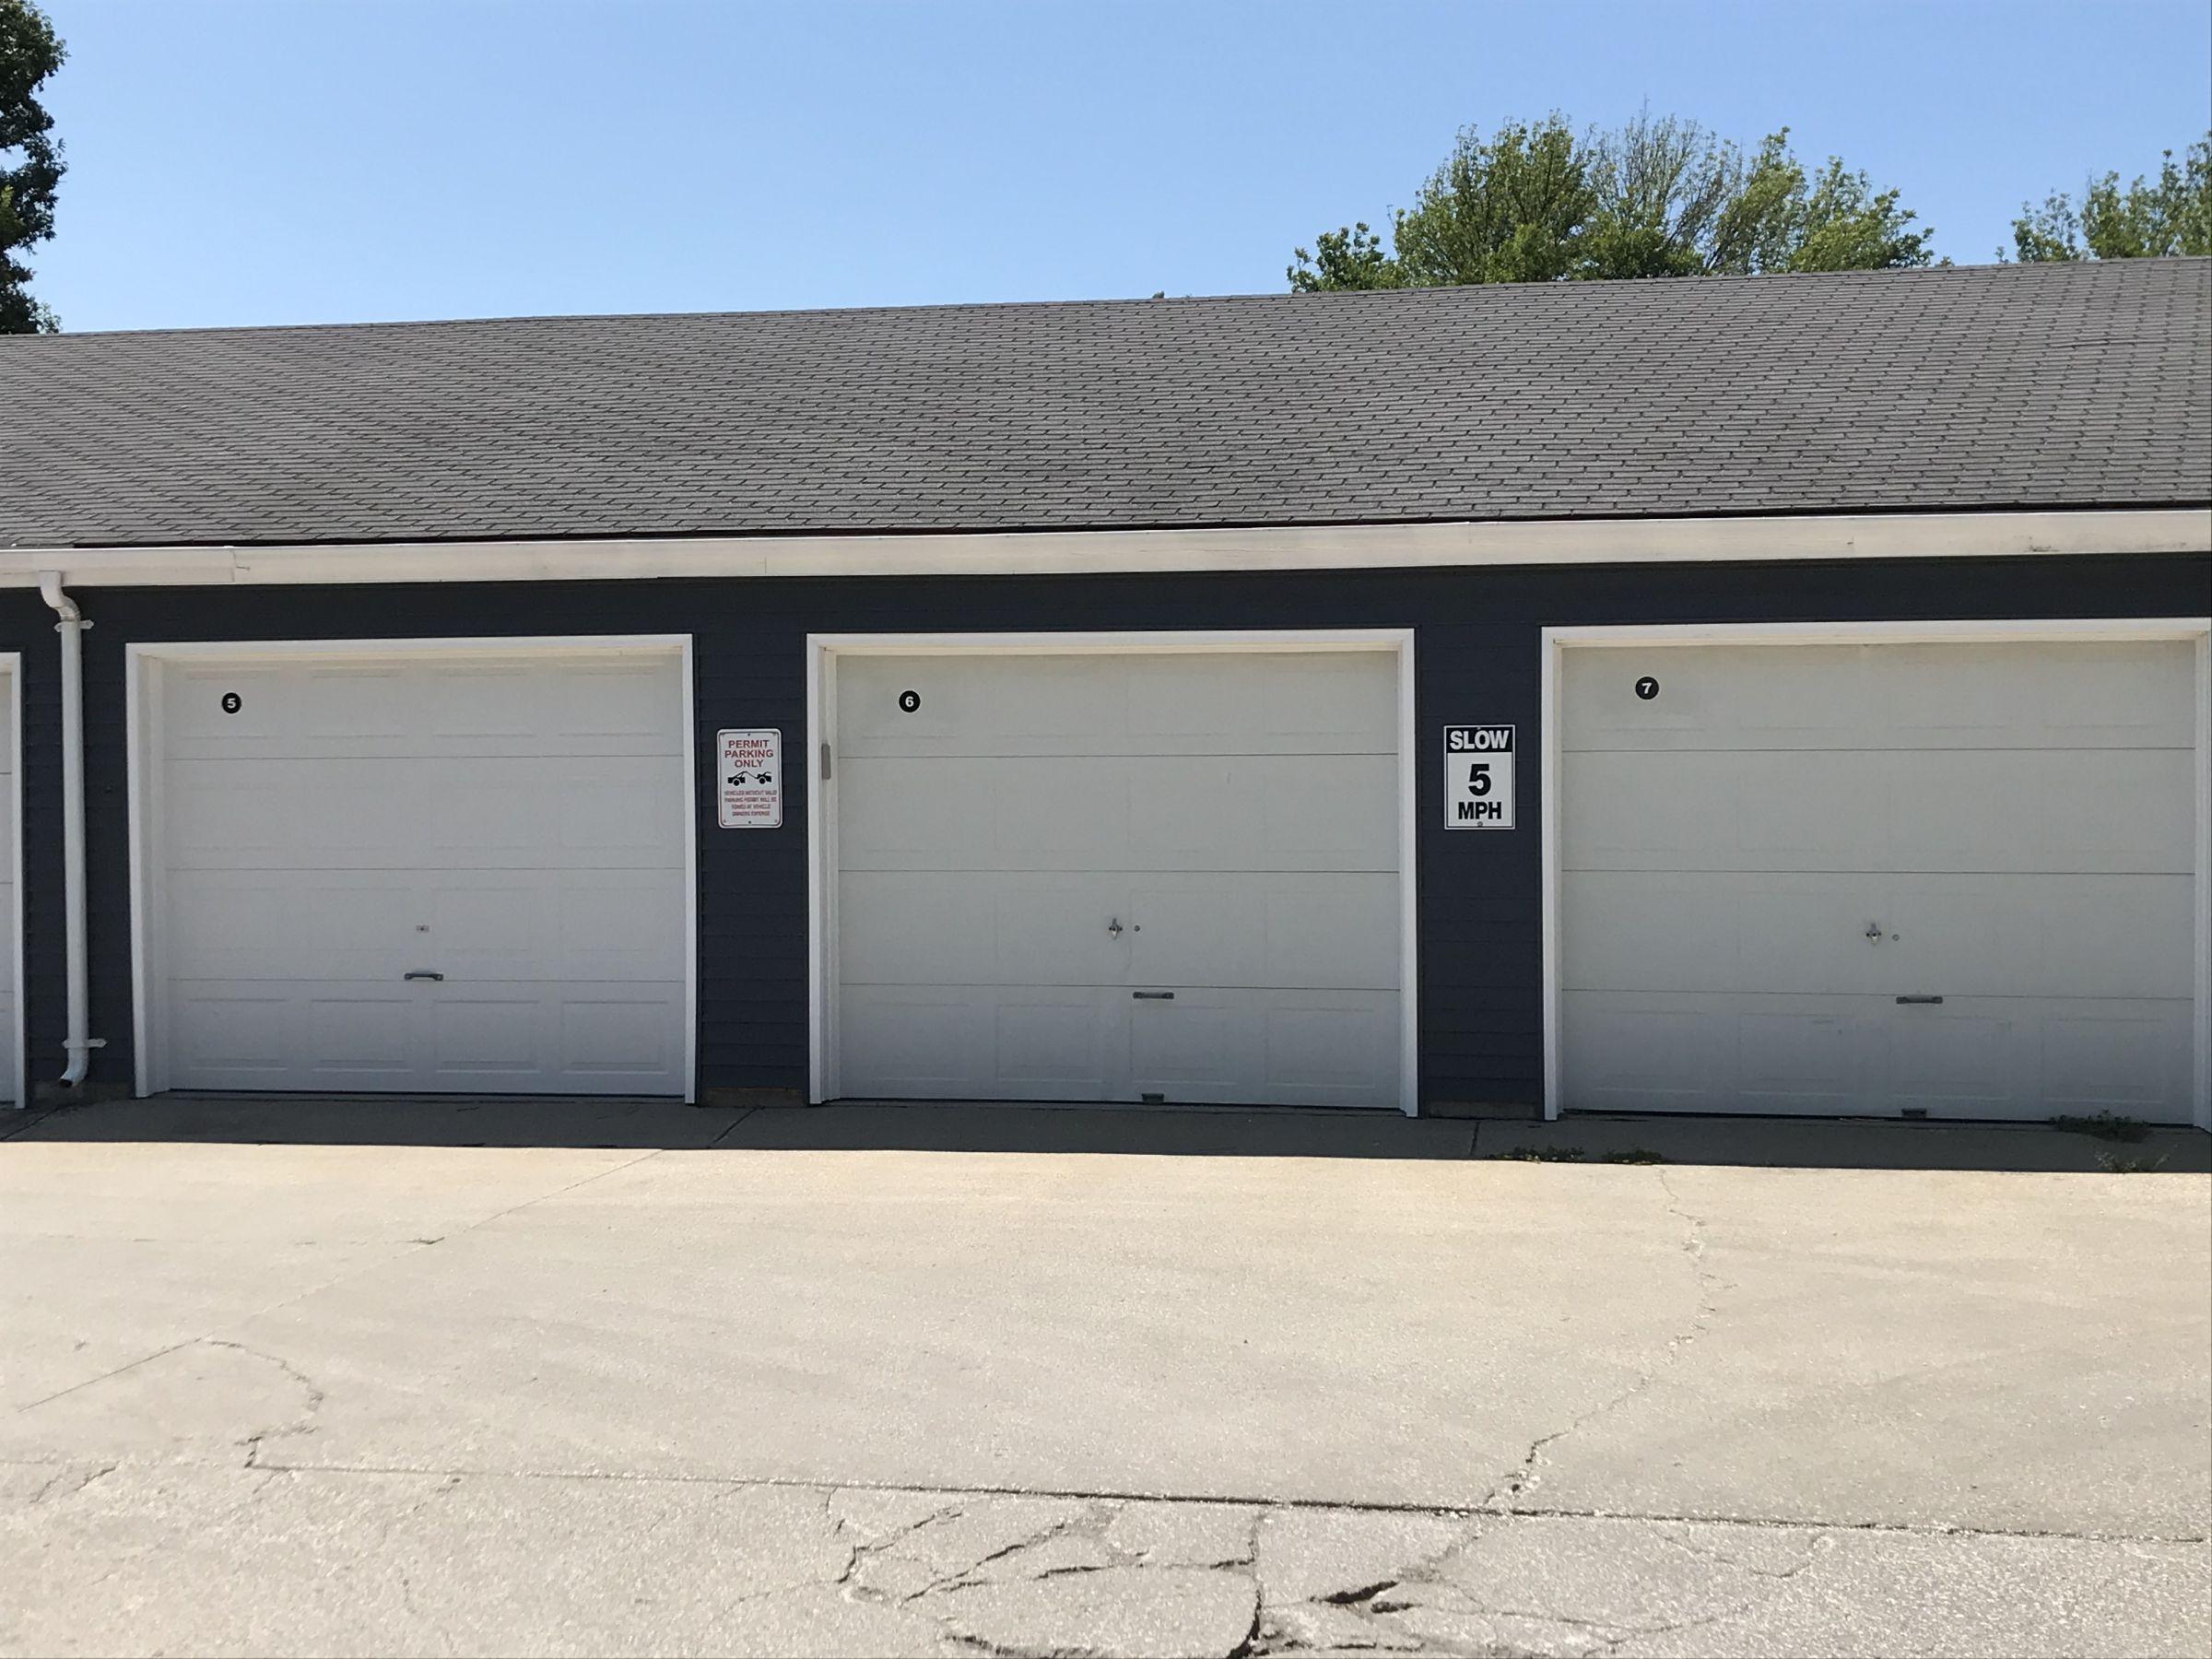 residential-warren-county-iowa-0-acres-listing-number-15111-0-2020-08-09-170842.jpg